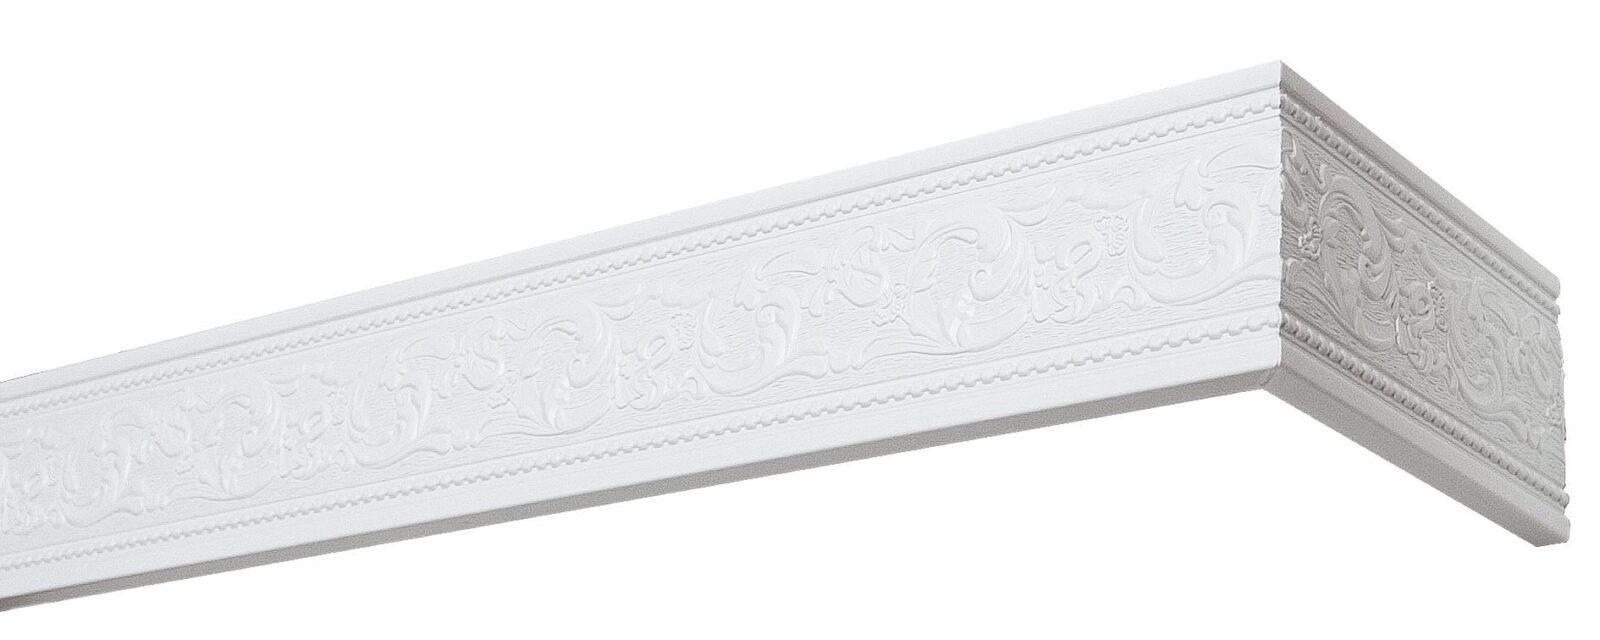 Комплект боковин для карниза Унисон 2014 белый 80мм